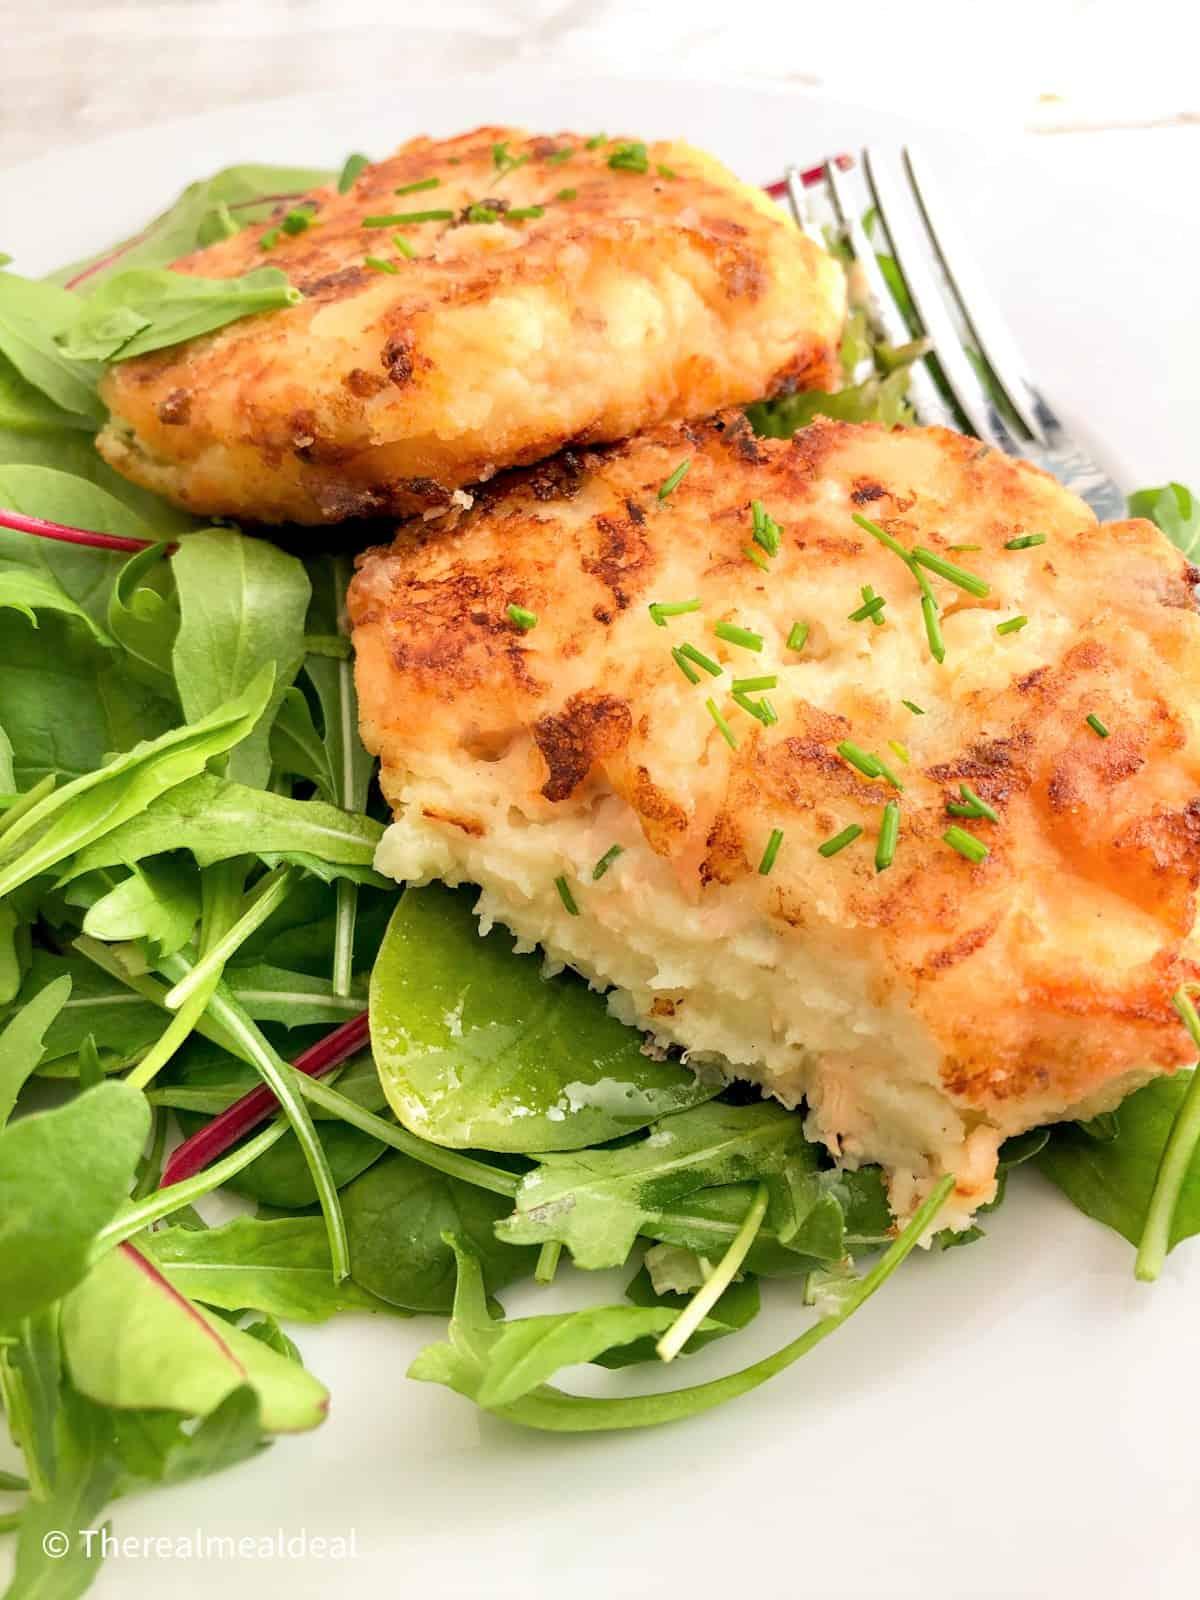 salmon fishcakes with green salad